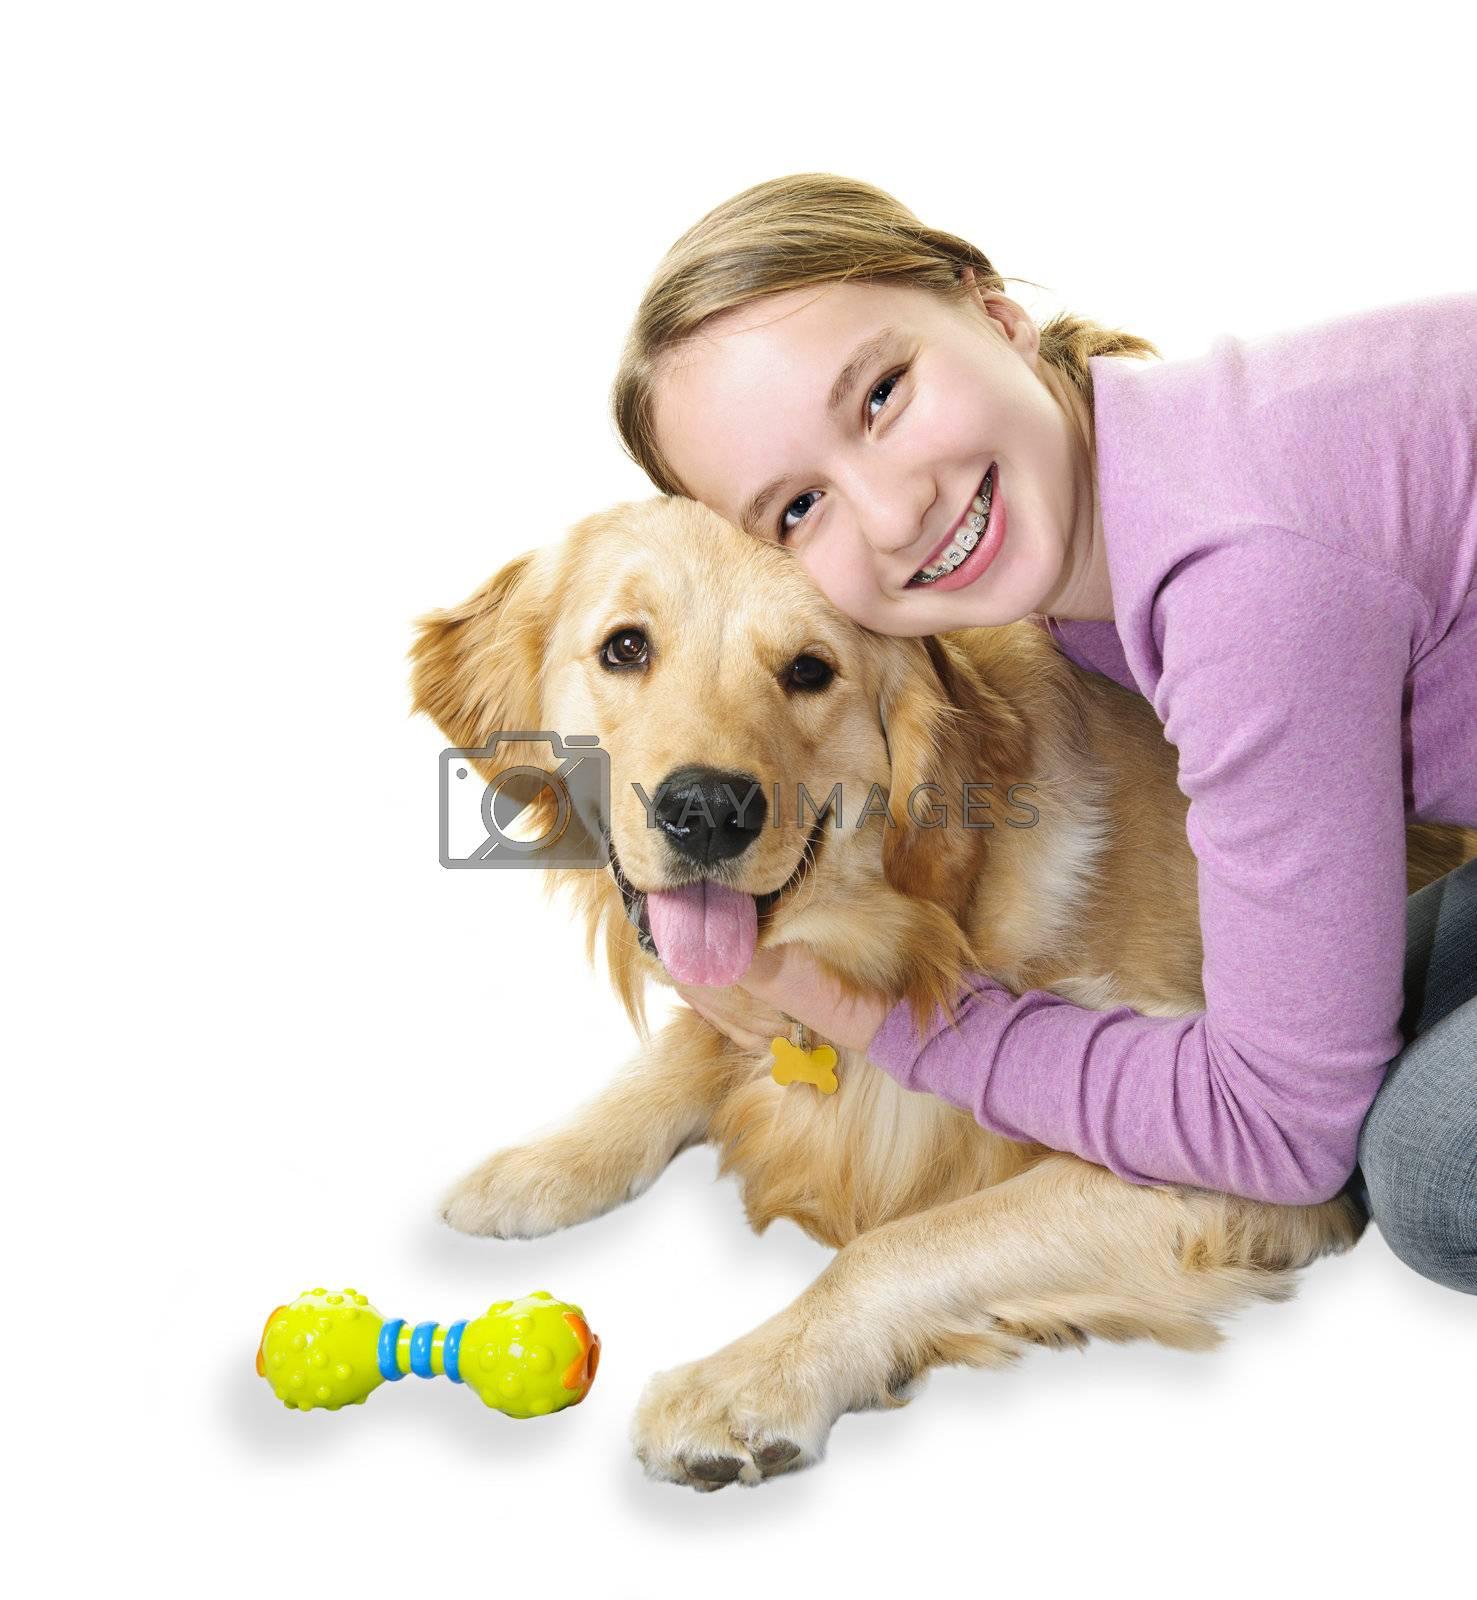 Teenage girl hugging golden retriever pet dog isolated on white background